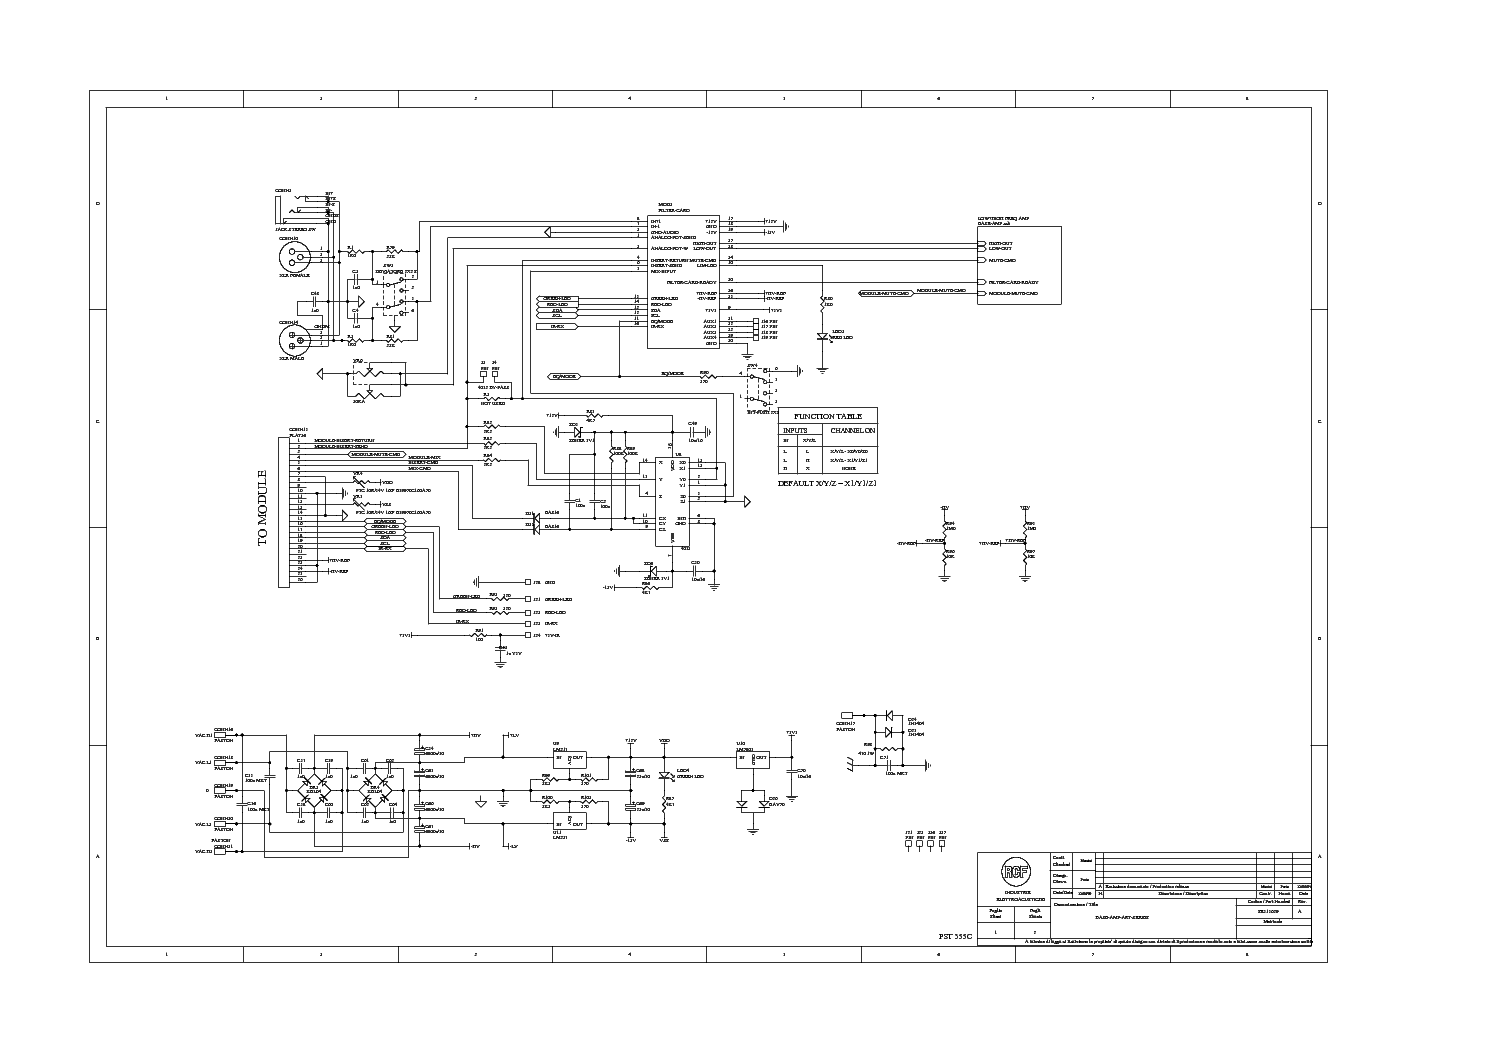 2500hd service manual pdf download